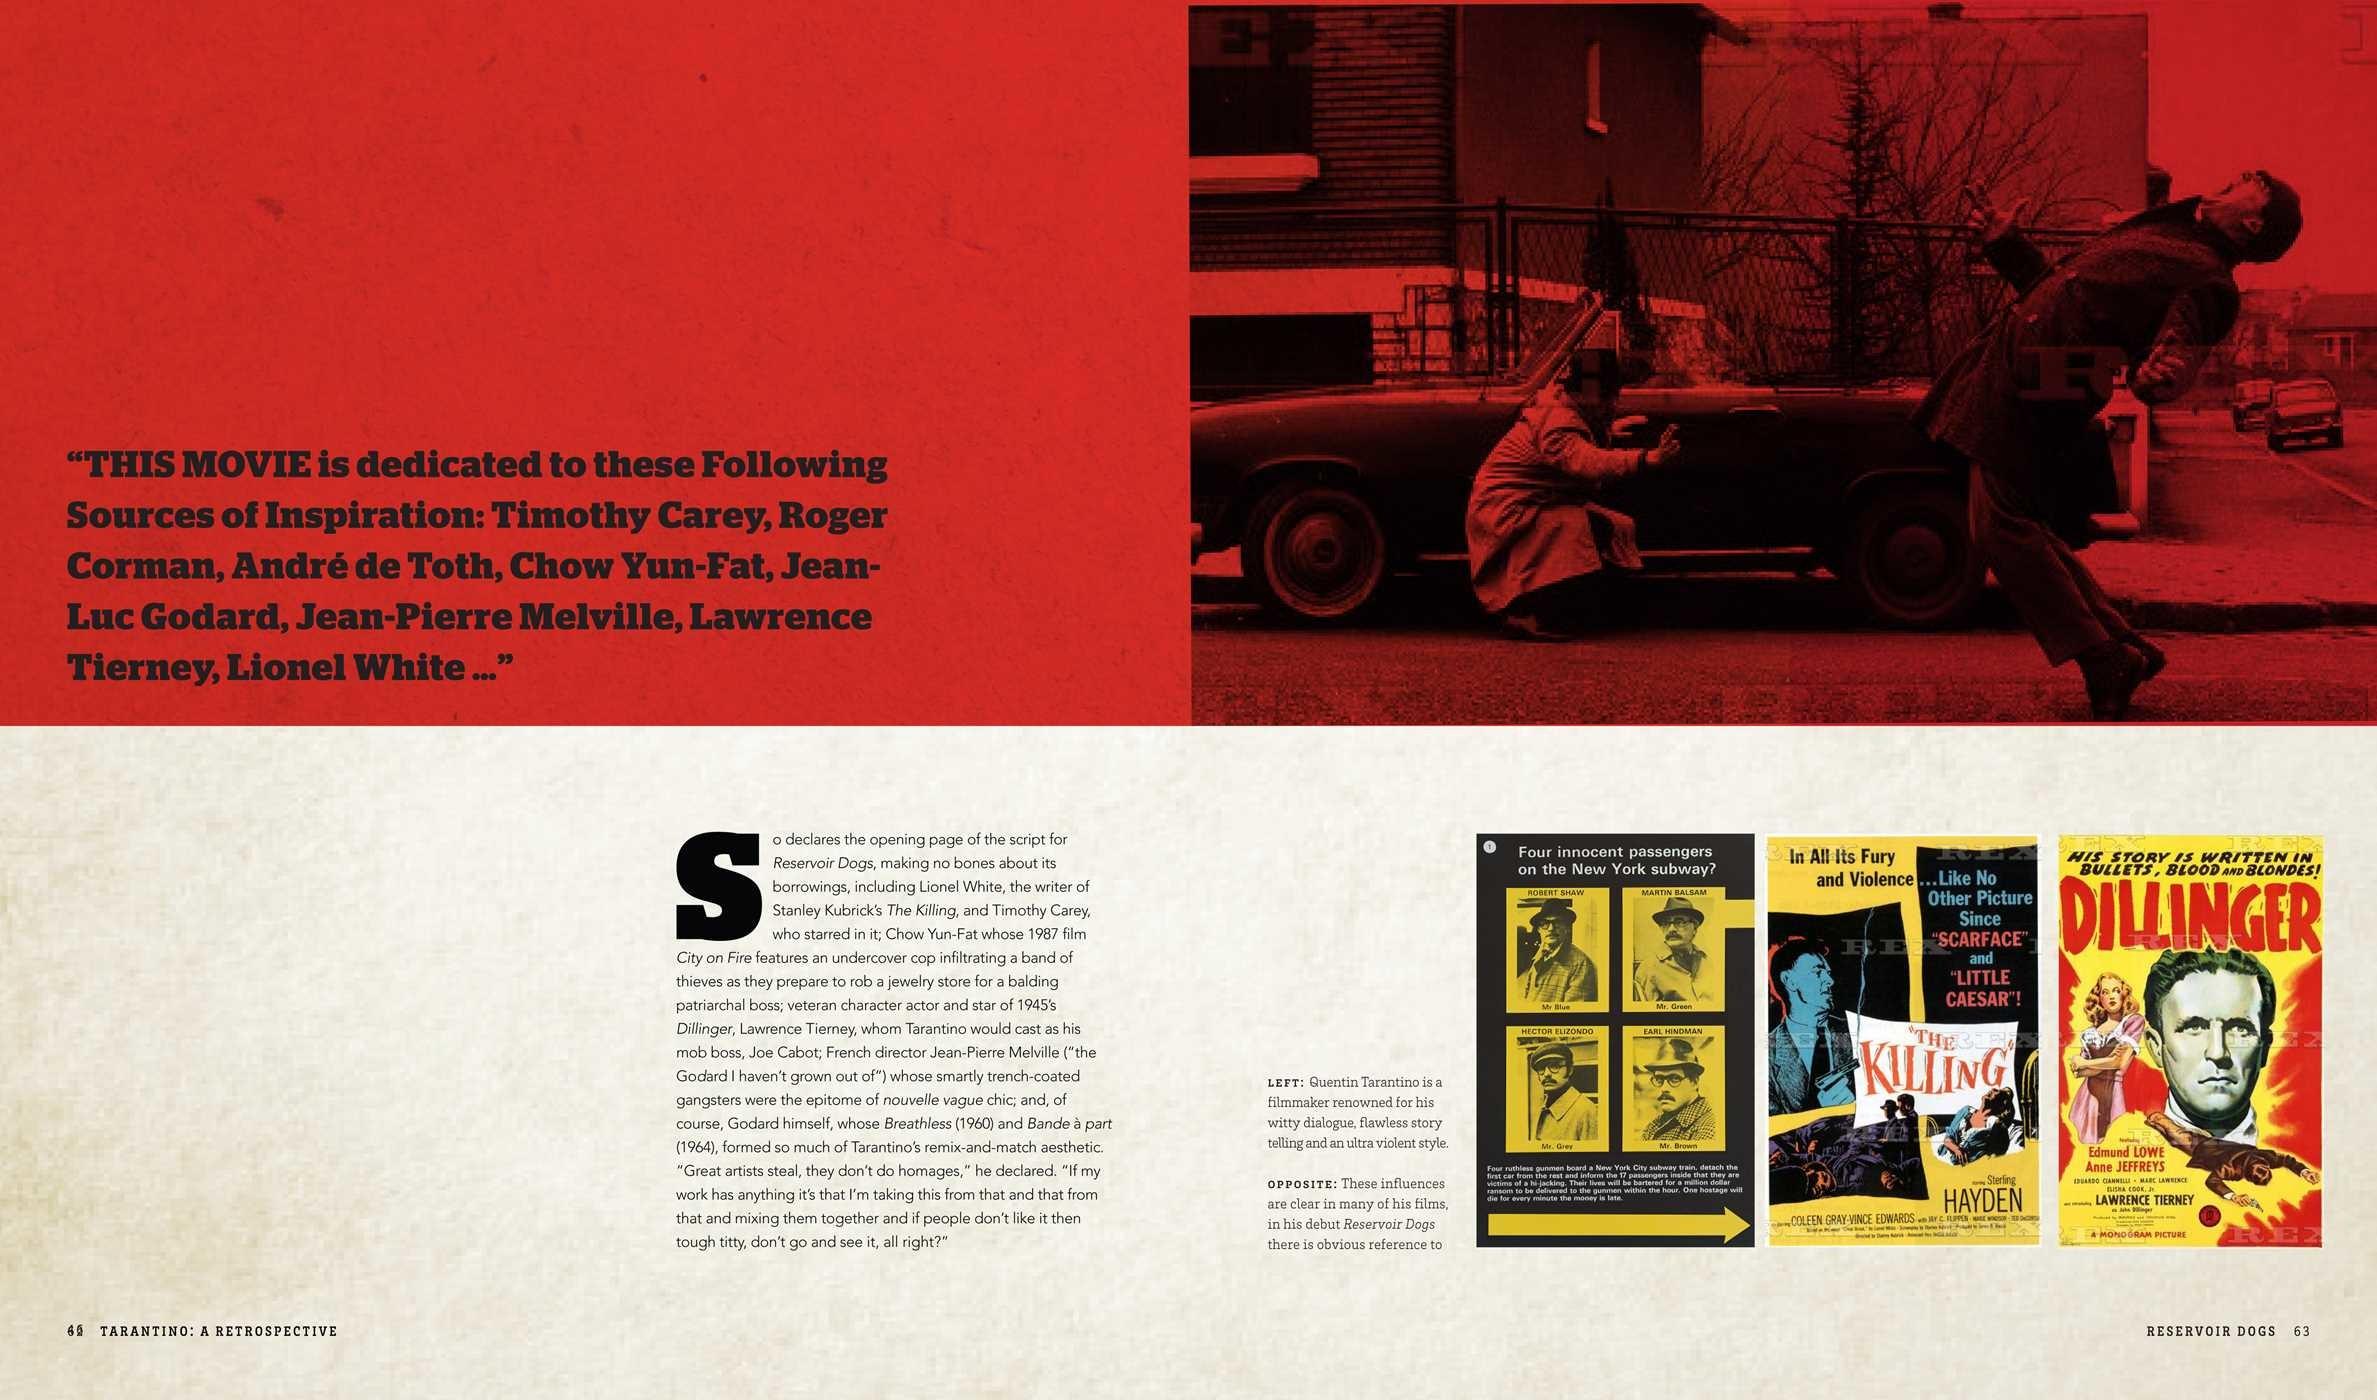 Tarantino a retrospective 9781683830986.in02